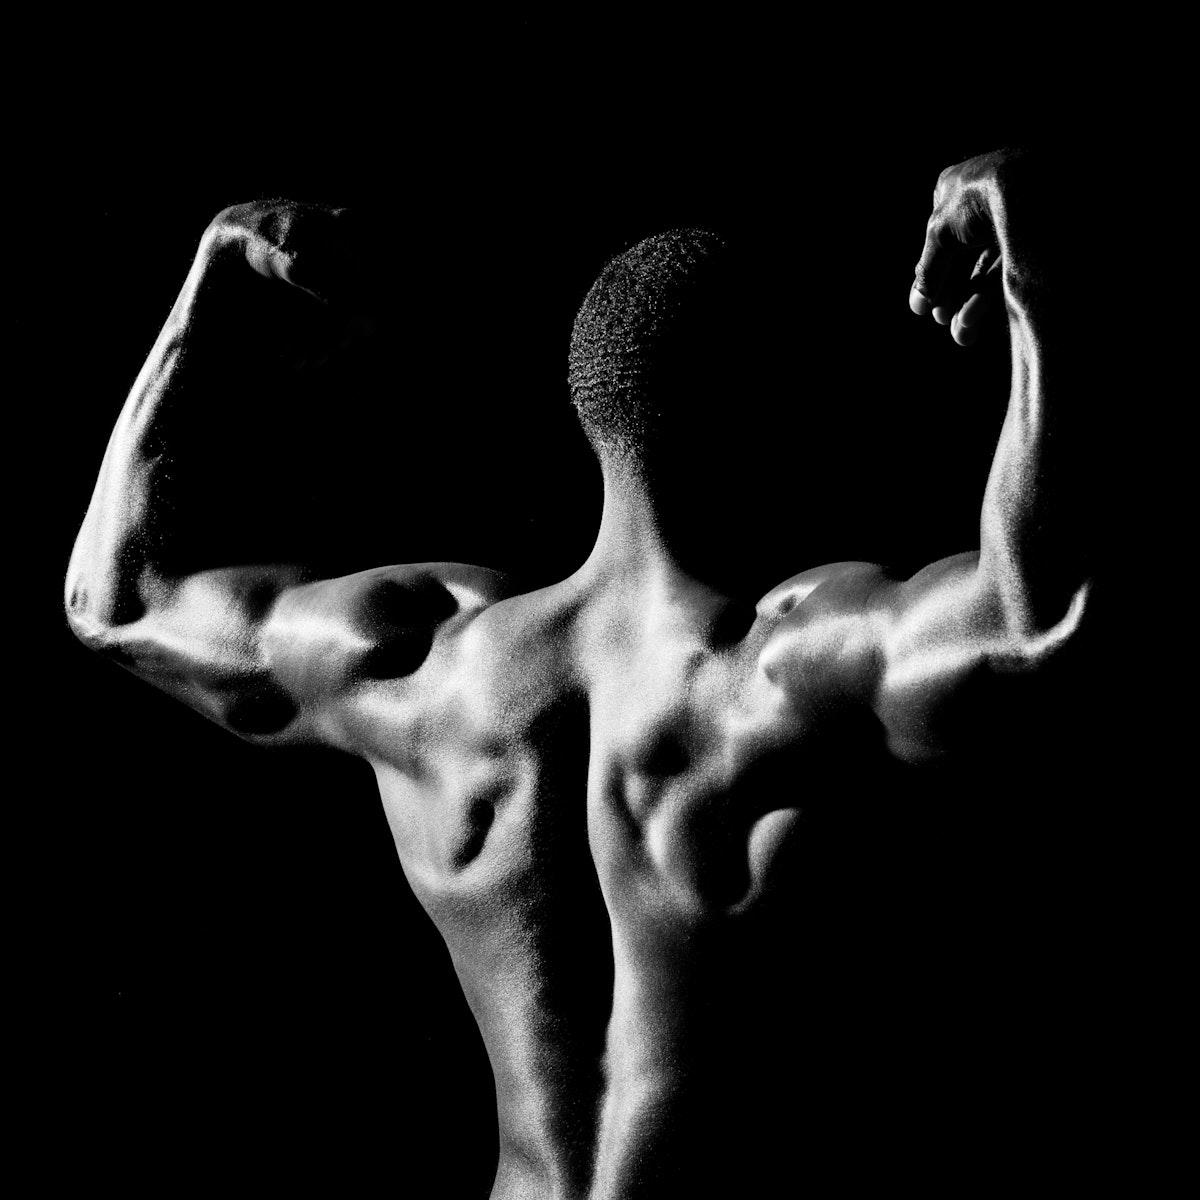 Rear view of muscular black man social template